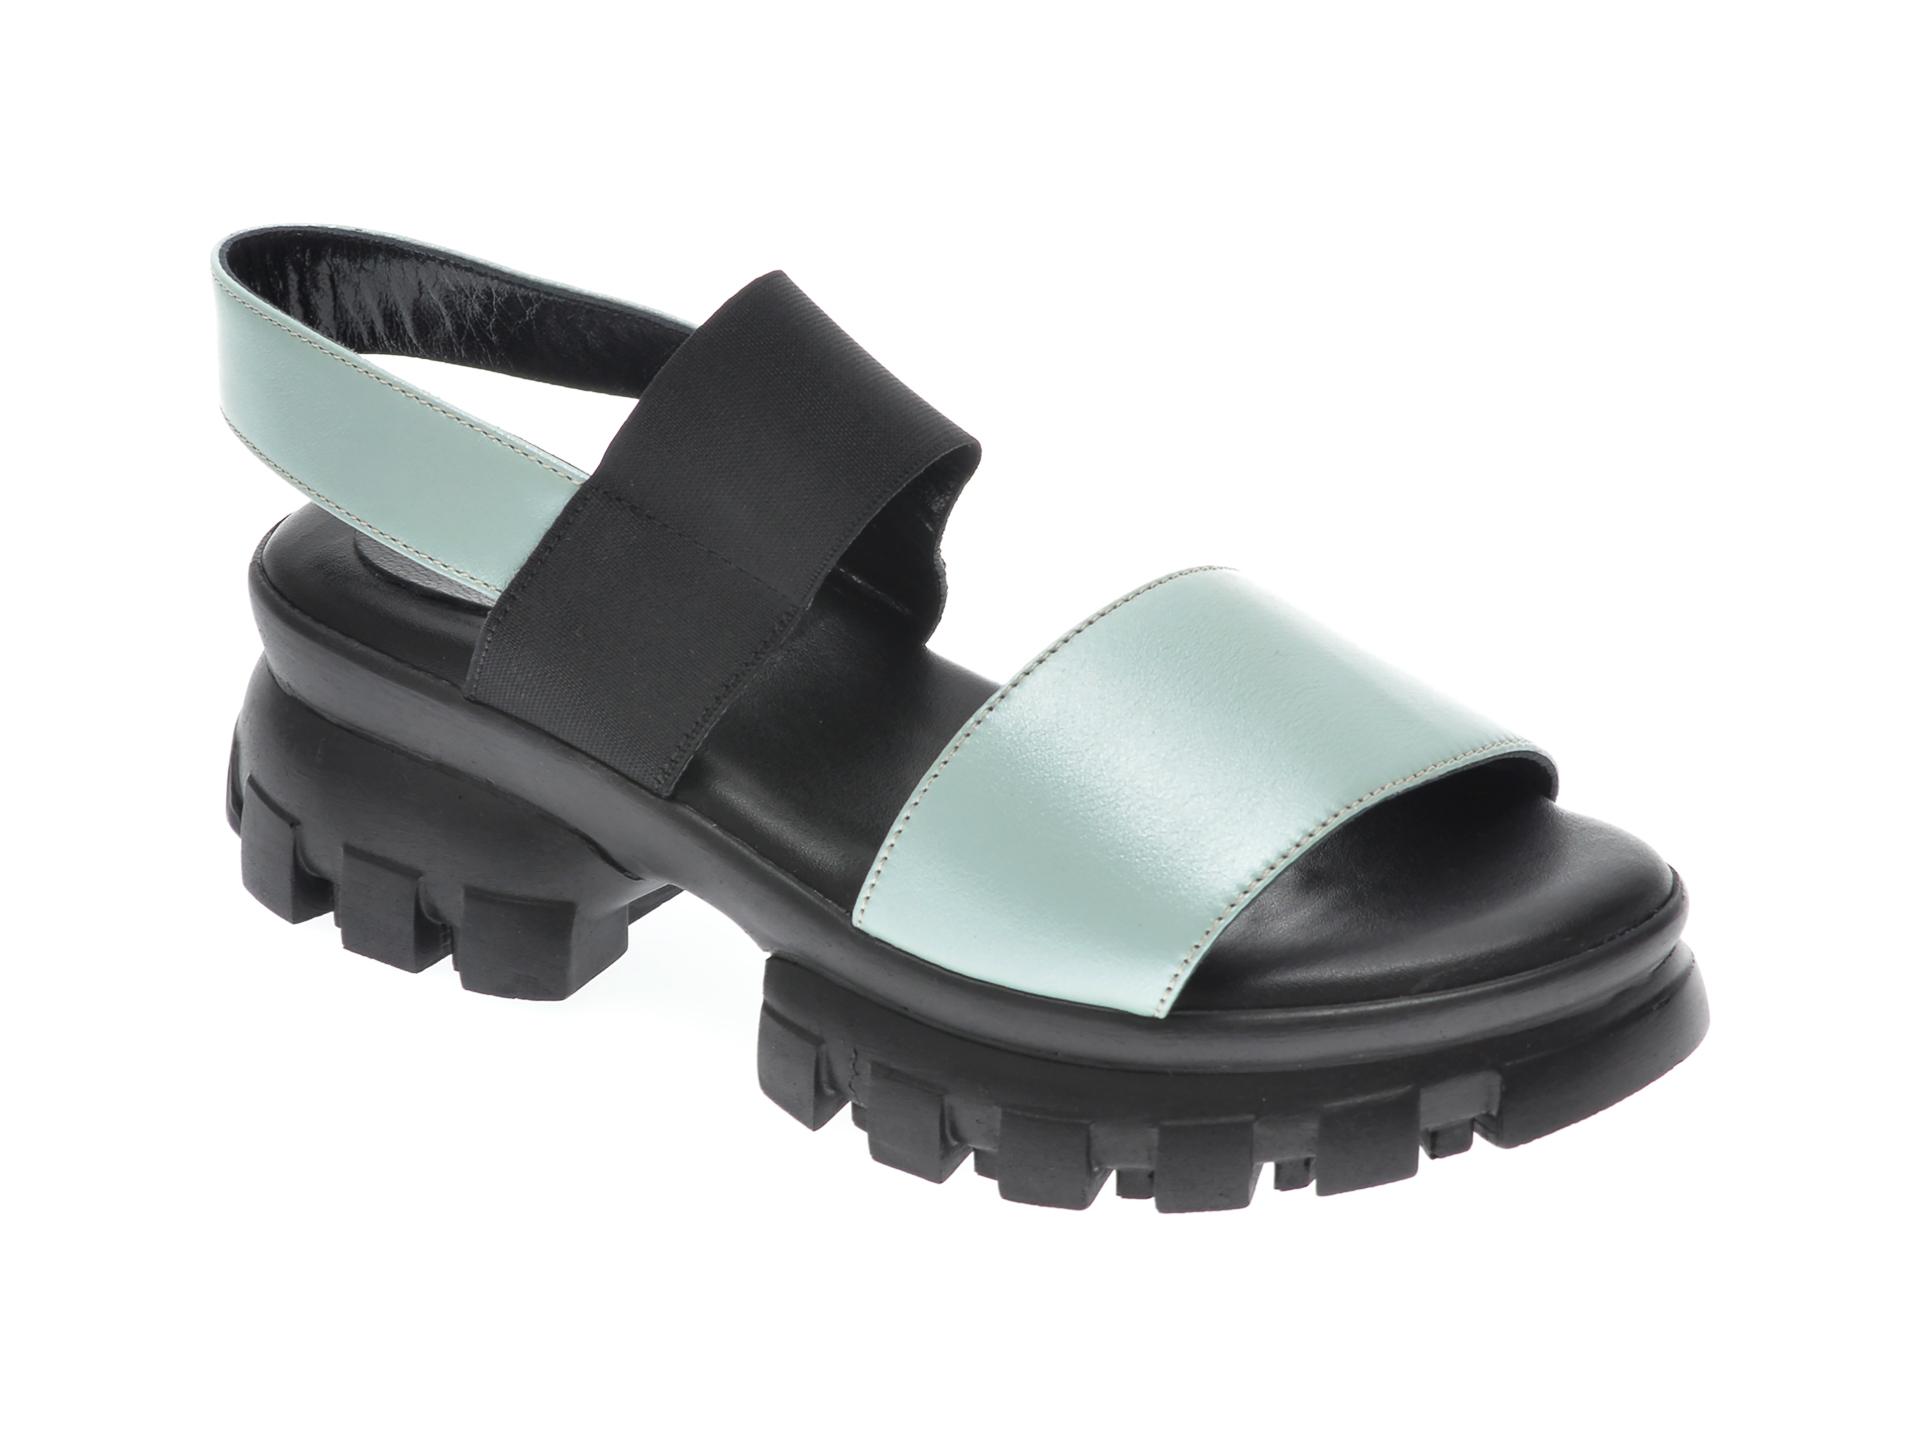 Sandale UNICA verzi, A6034, din piele naturala